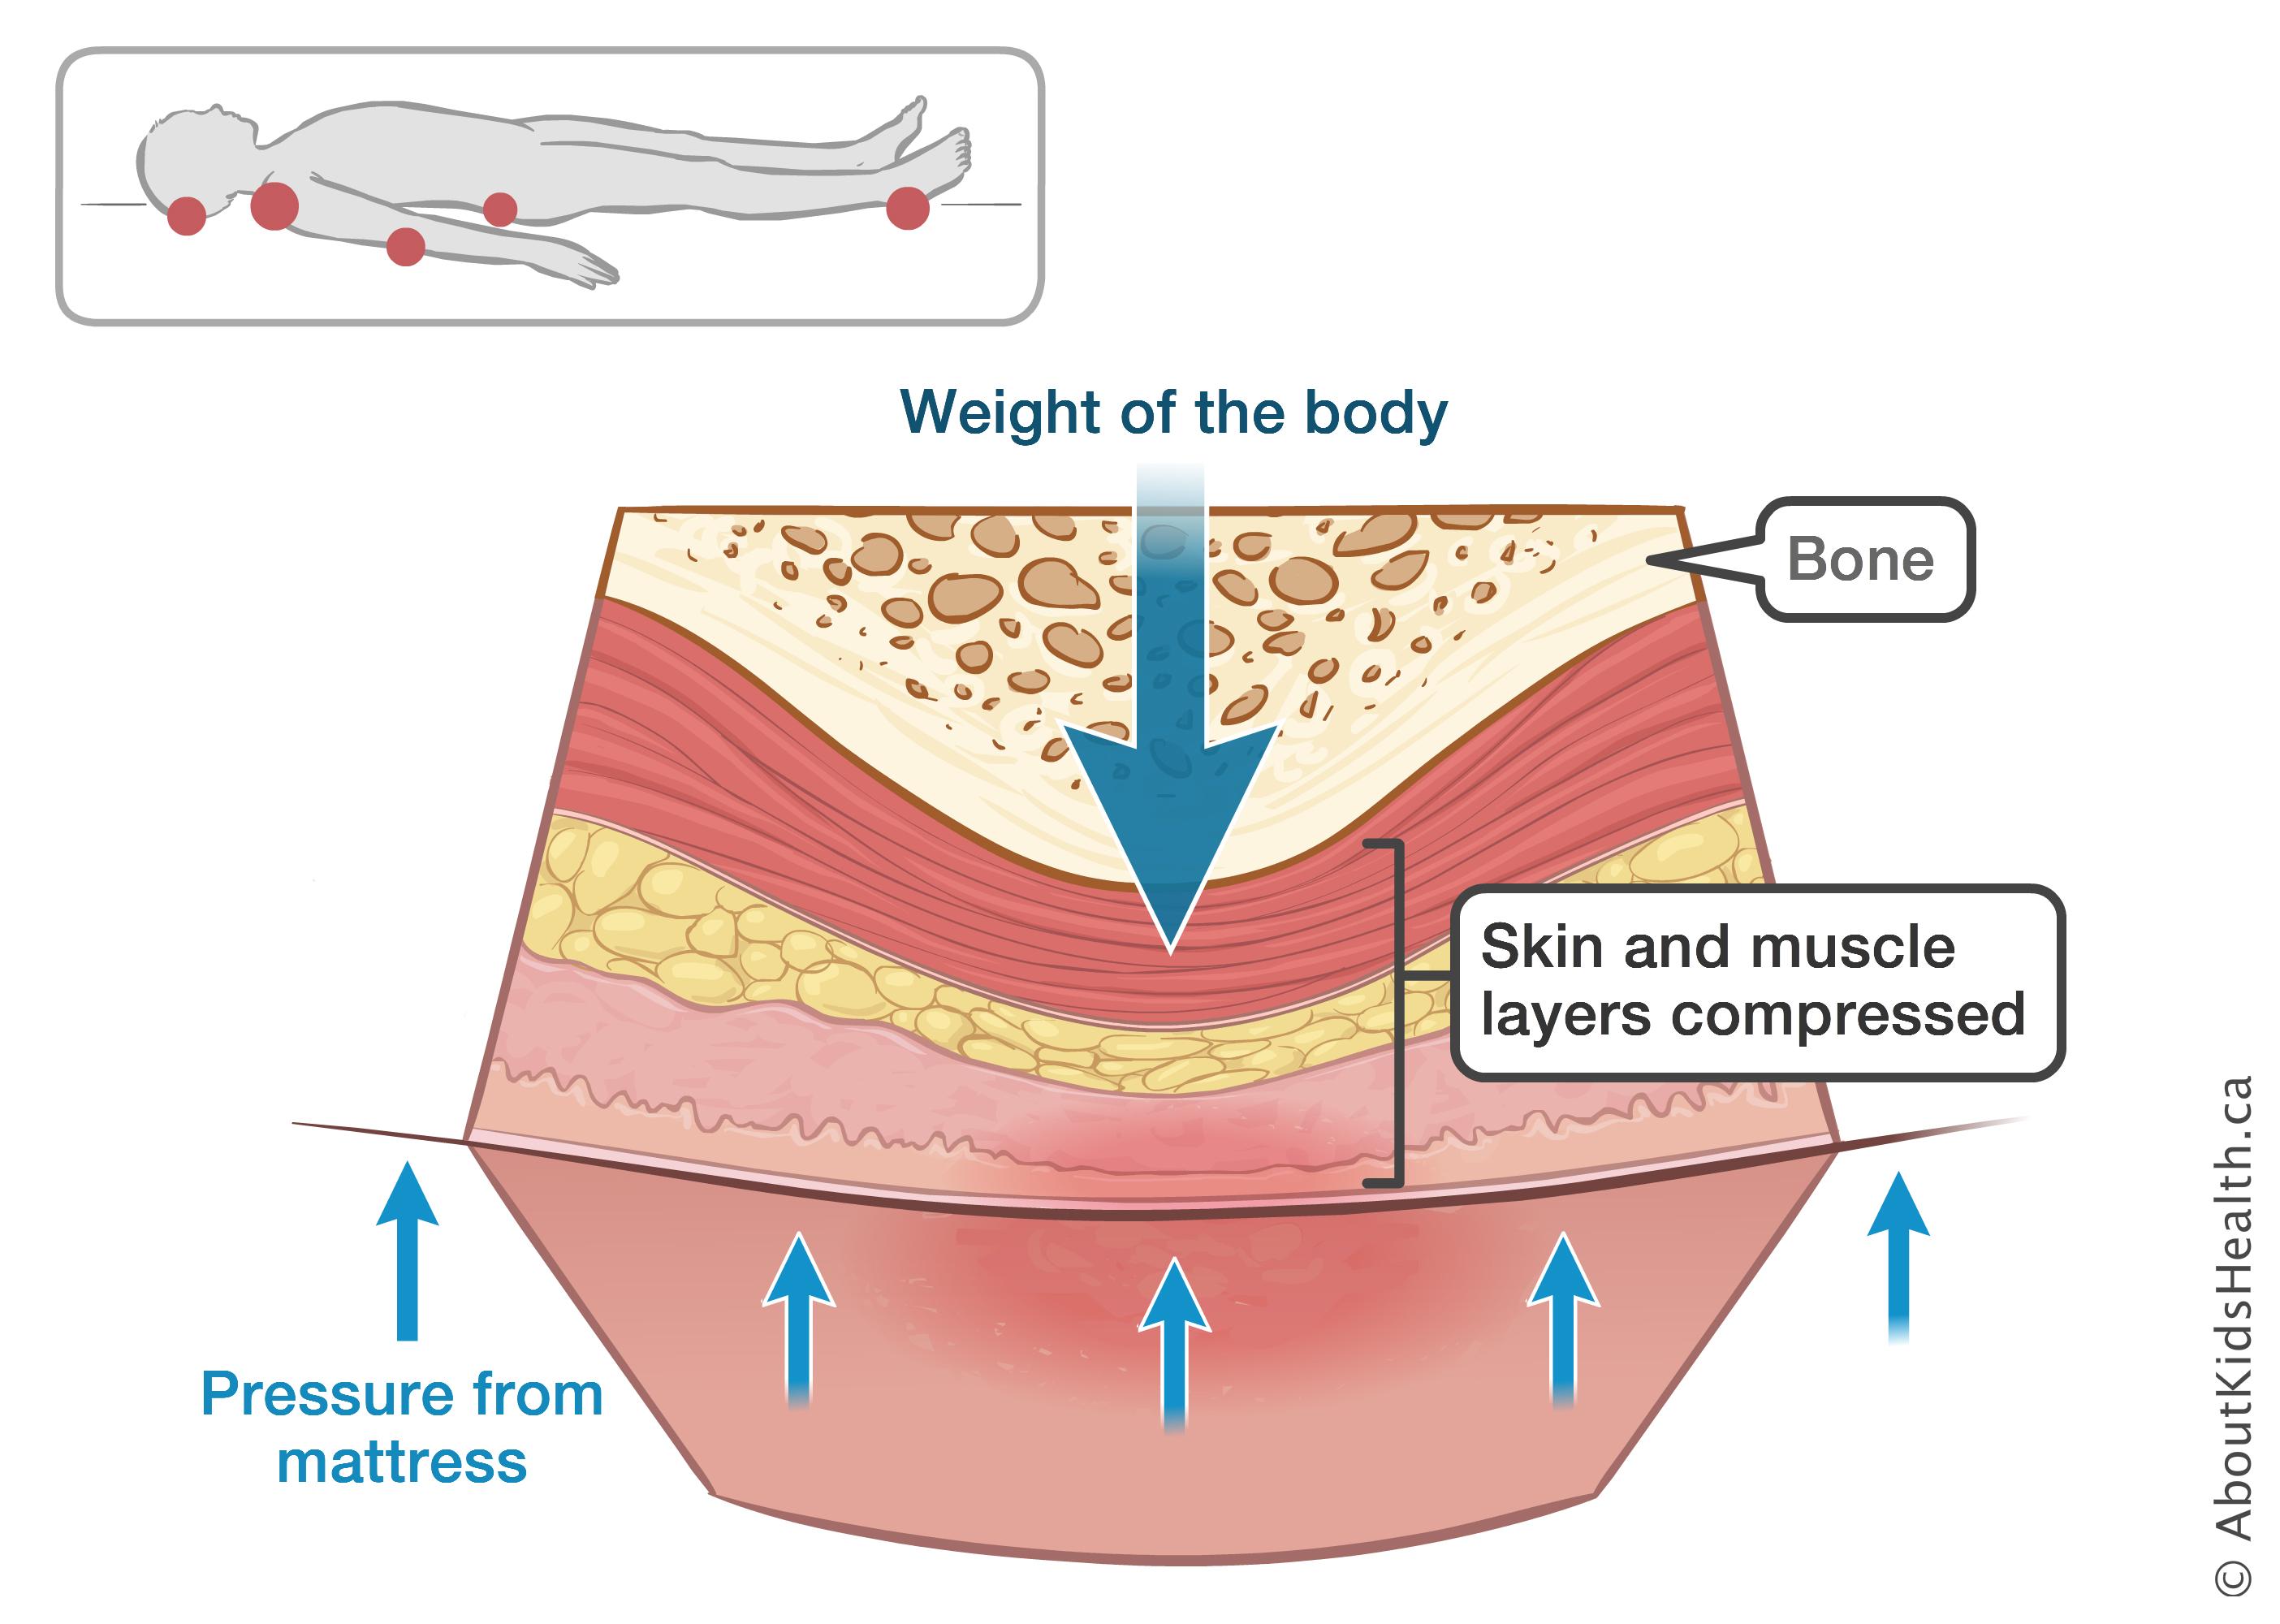 A description of decubitus ulcers also known as bedsores